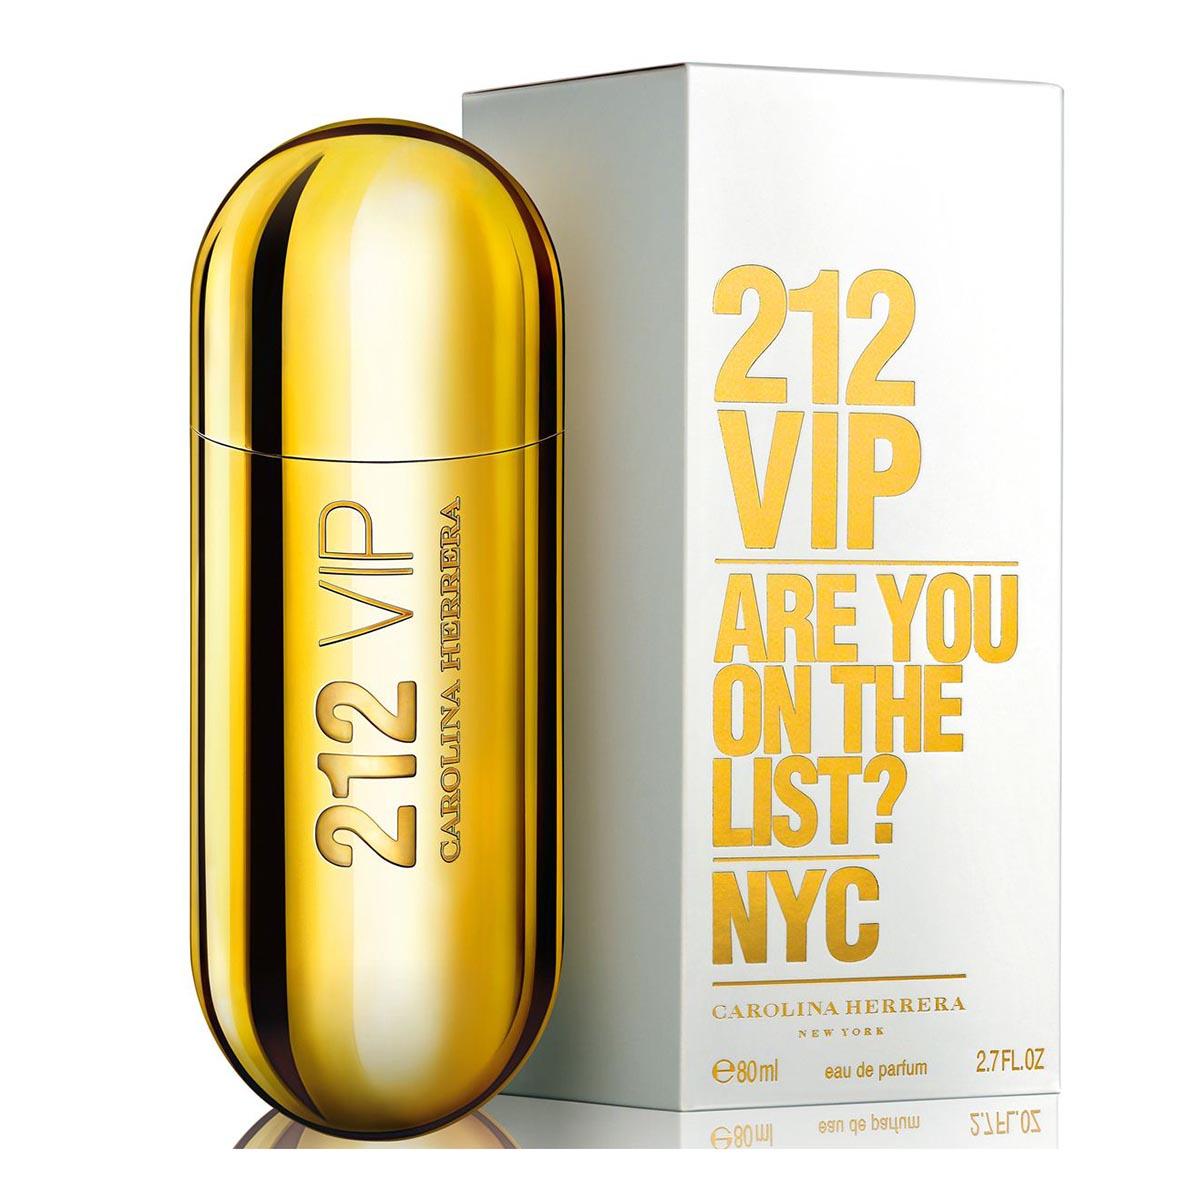 Carolina herrera 212 vip eau de parfum 80ml vaporizador